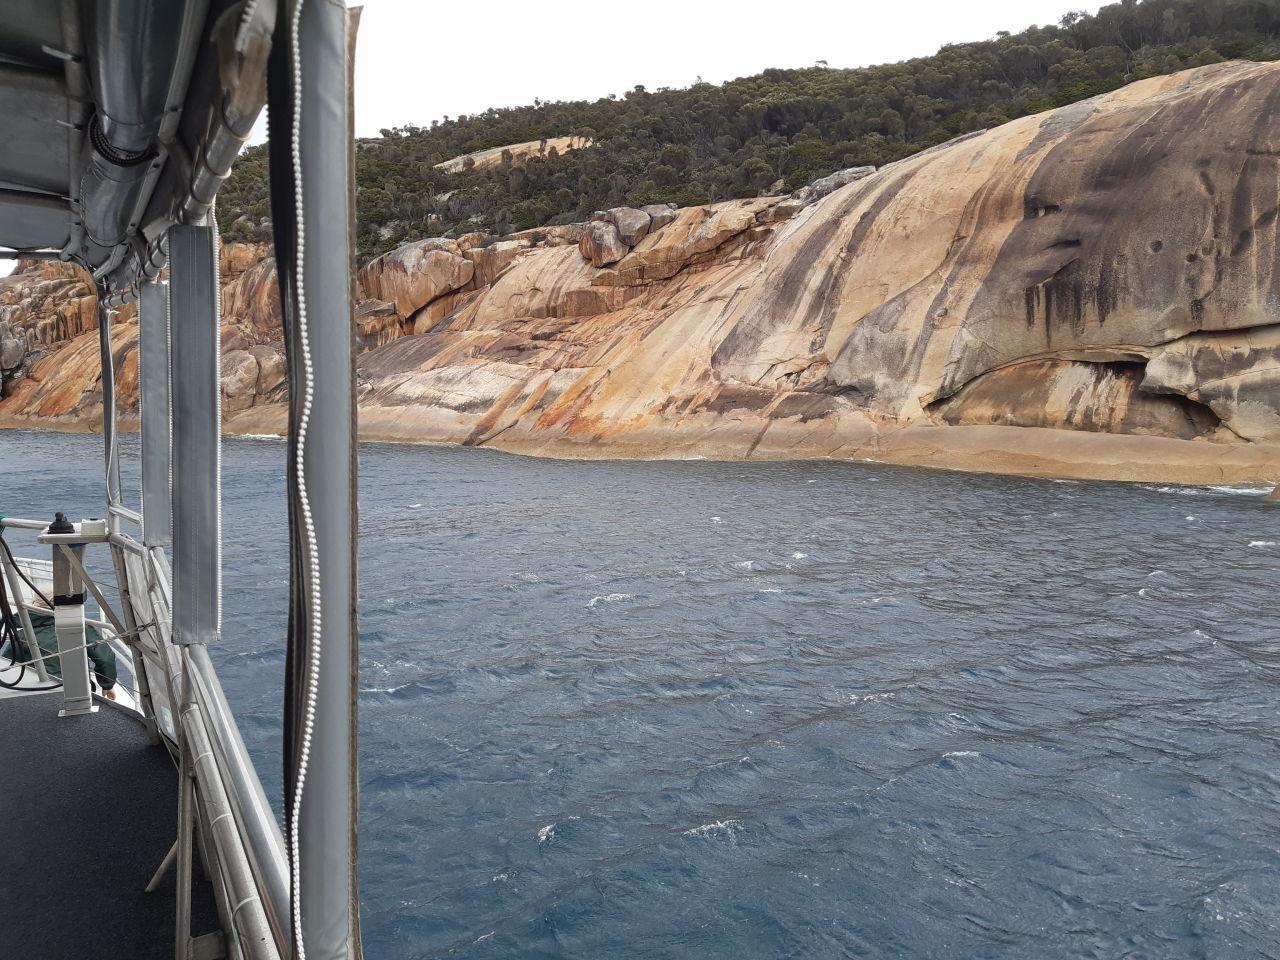 boat-rocks-scenery